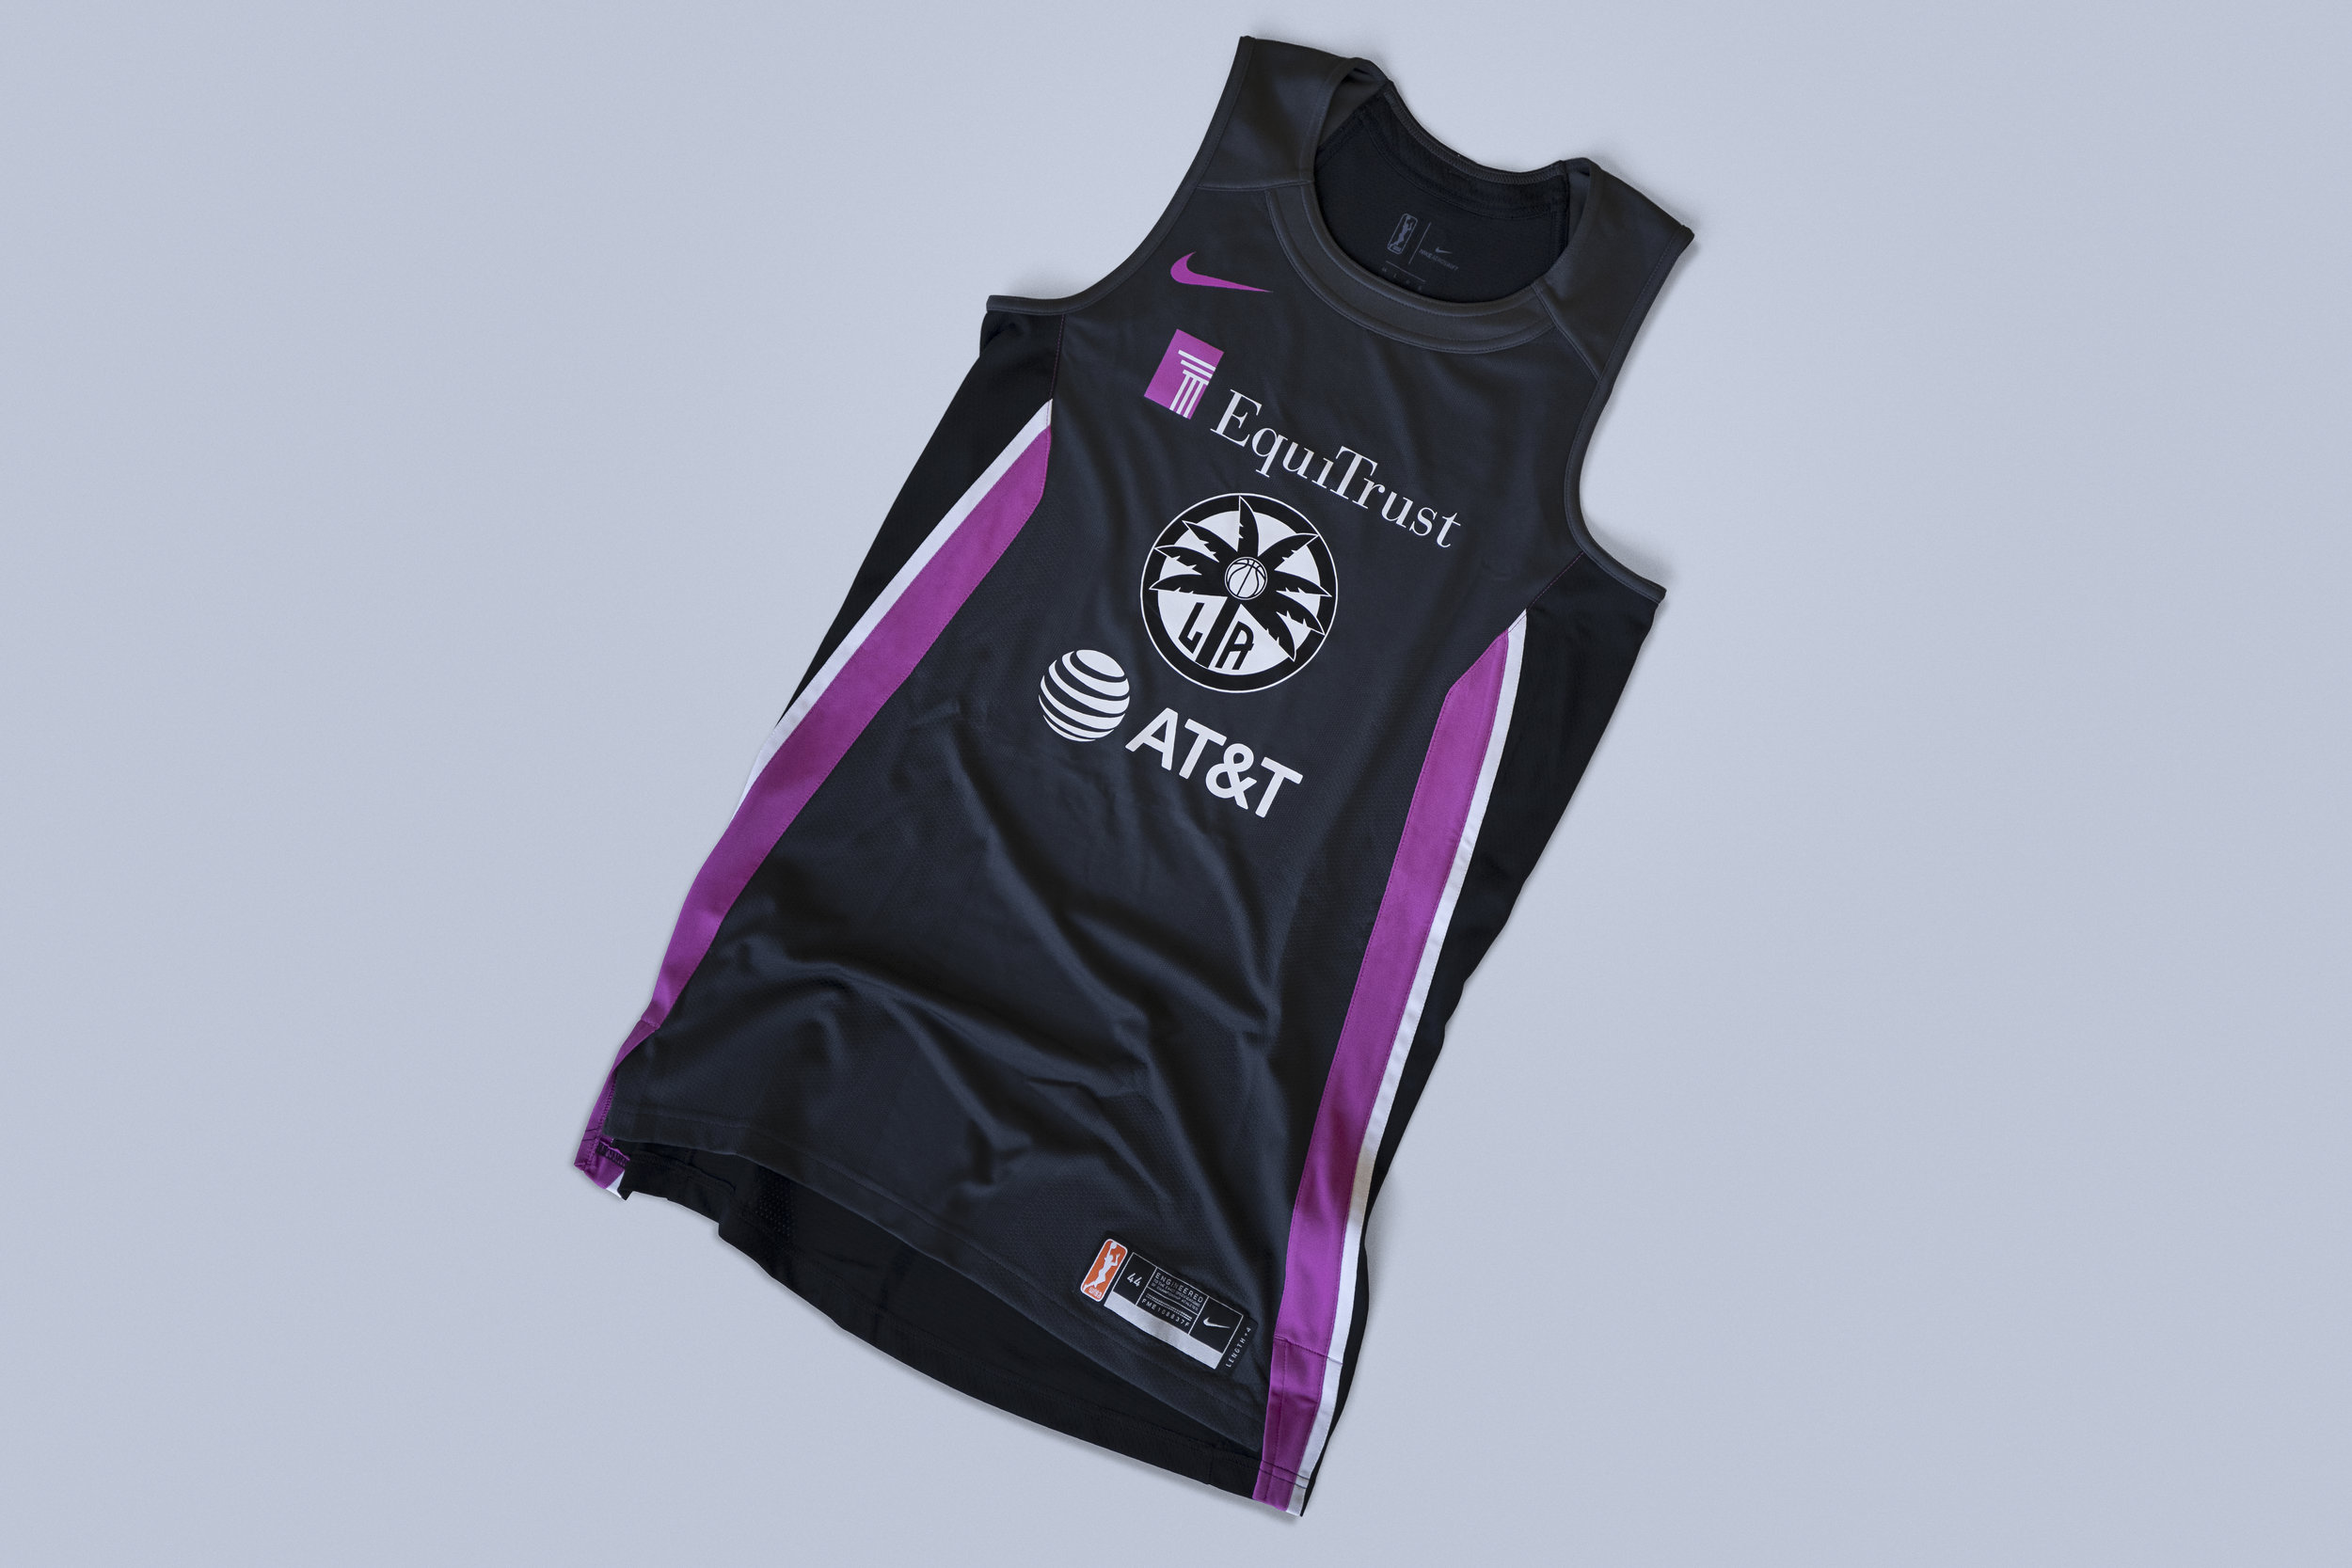 Nike_WNBA_Uniforms2019_BHA_LosAngelesSparks_IMG_9045_86892.jpg